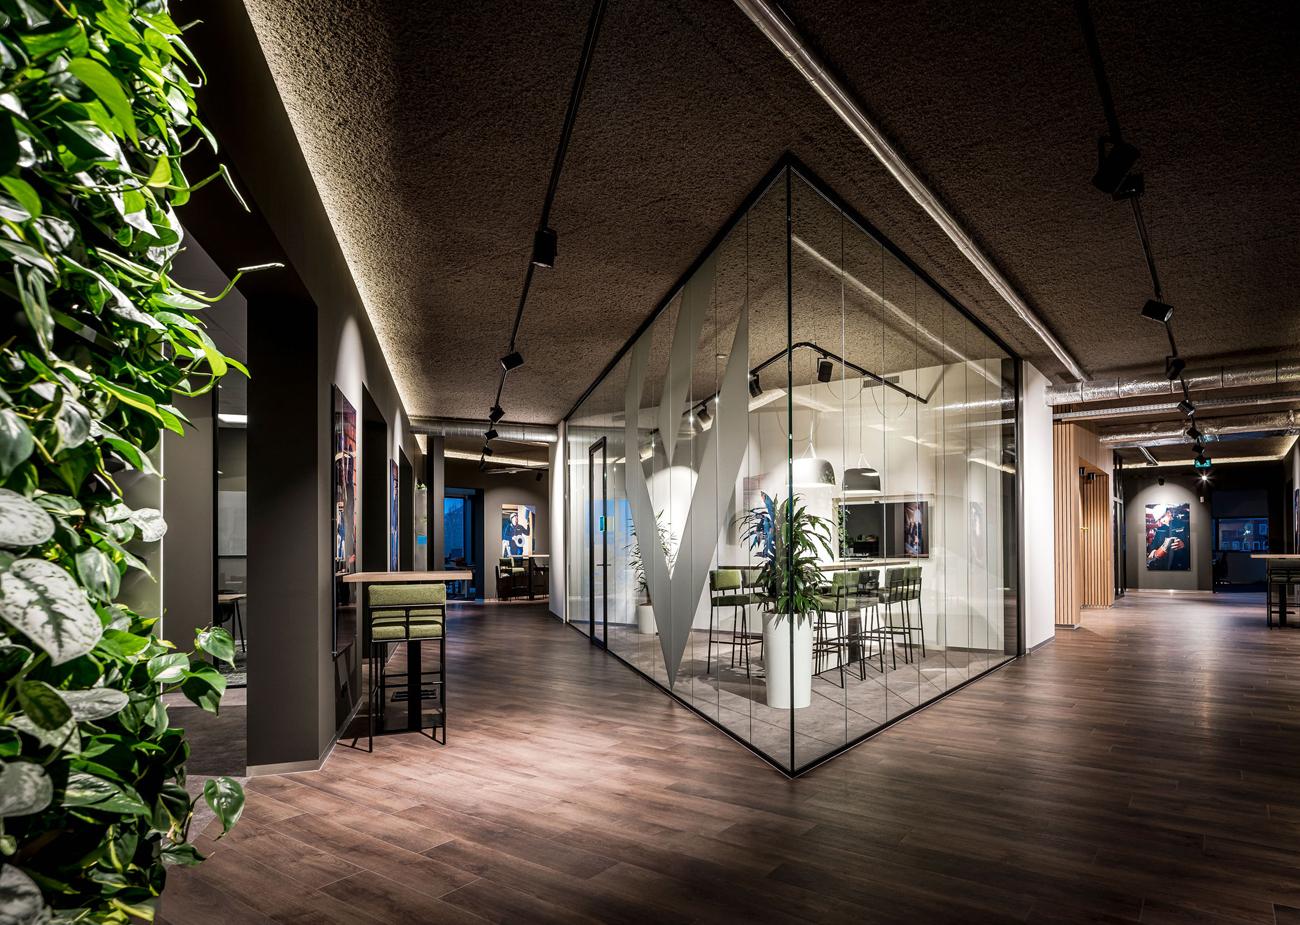 Interieurarchitect Stan Wildenberg industrieel kantoor Lomans totaalinstallateur Capelle interieur ontwerp gangzone overlegruimte lichtlijn plafond